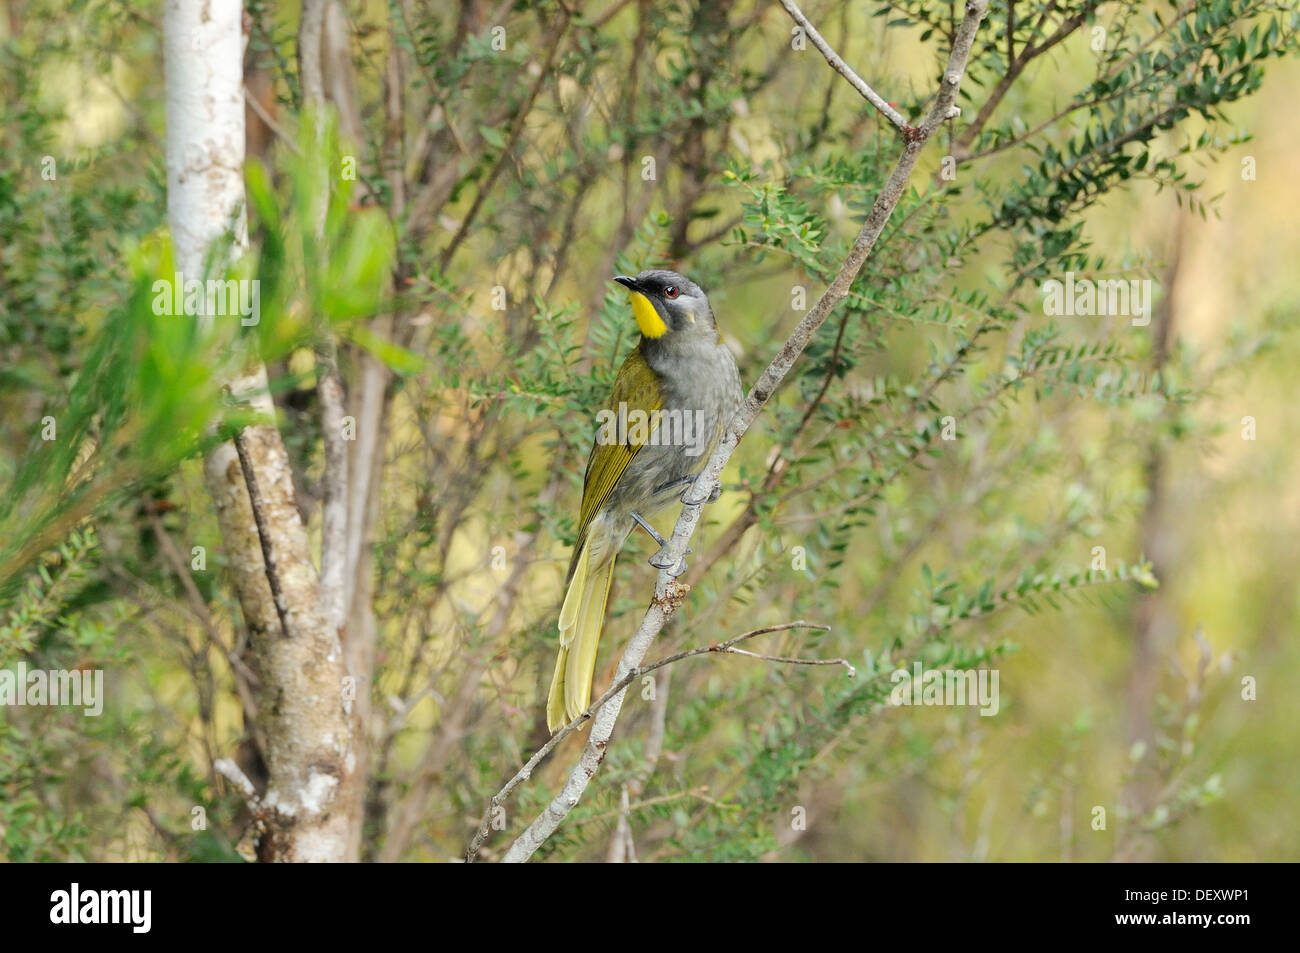 Yellow-throated Honeyeater Lichenostomus flavicollis Tasmanian endemic Photographed in Tasmania, Australia - Stock Image